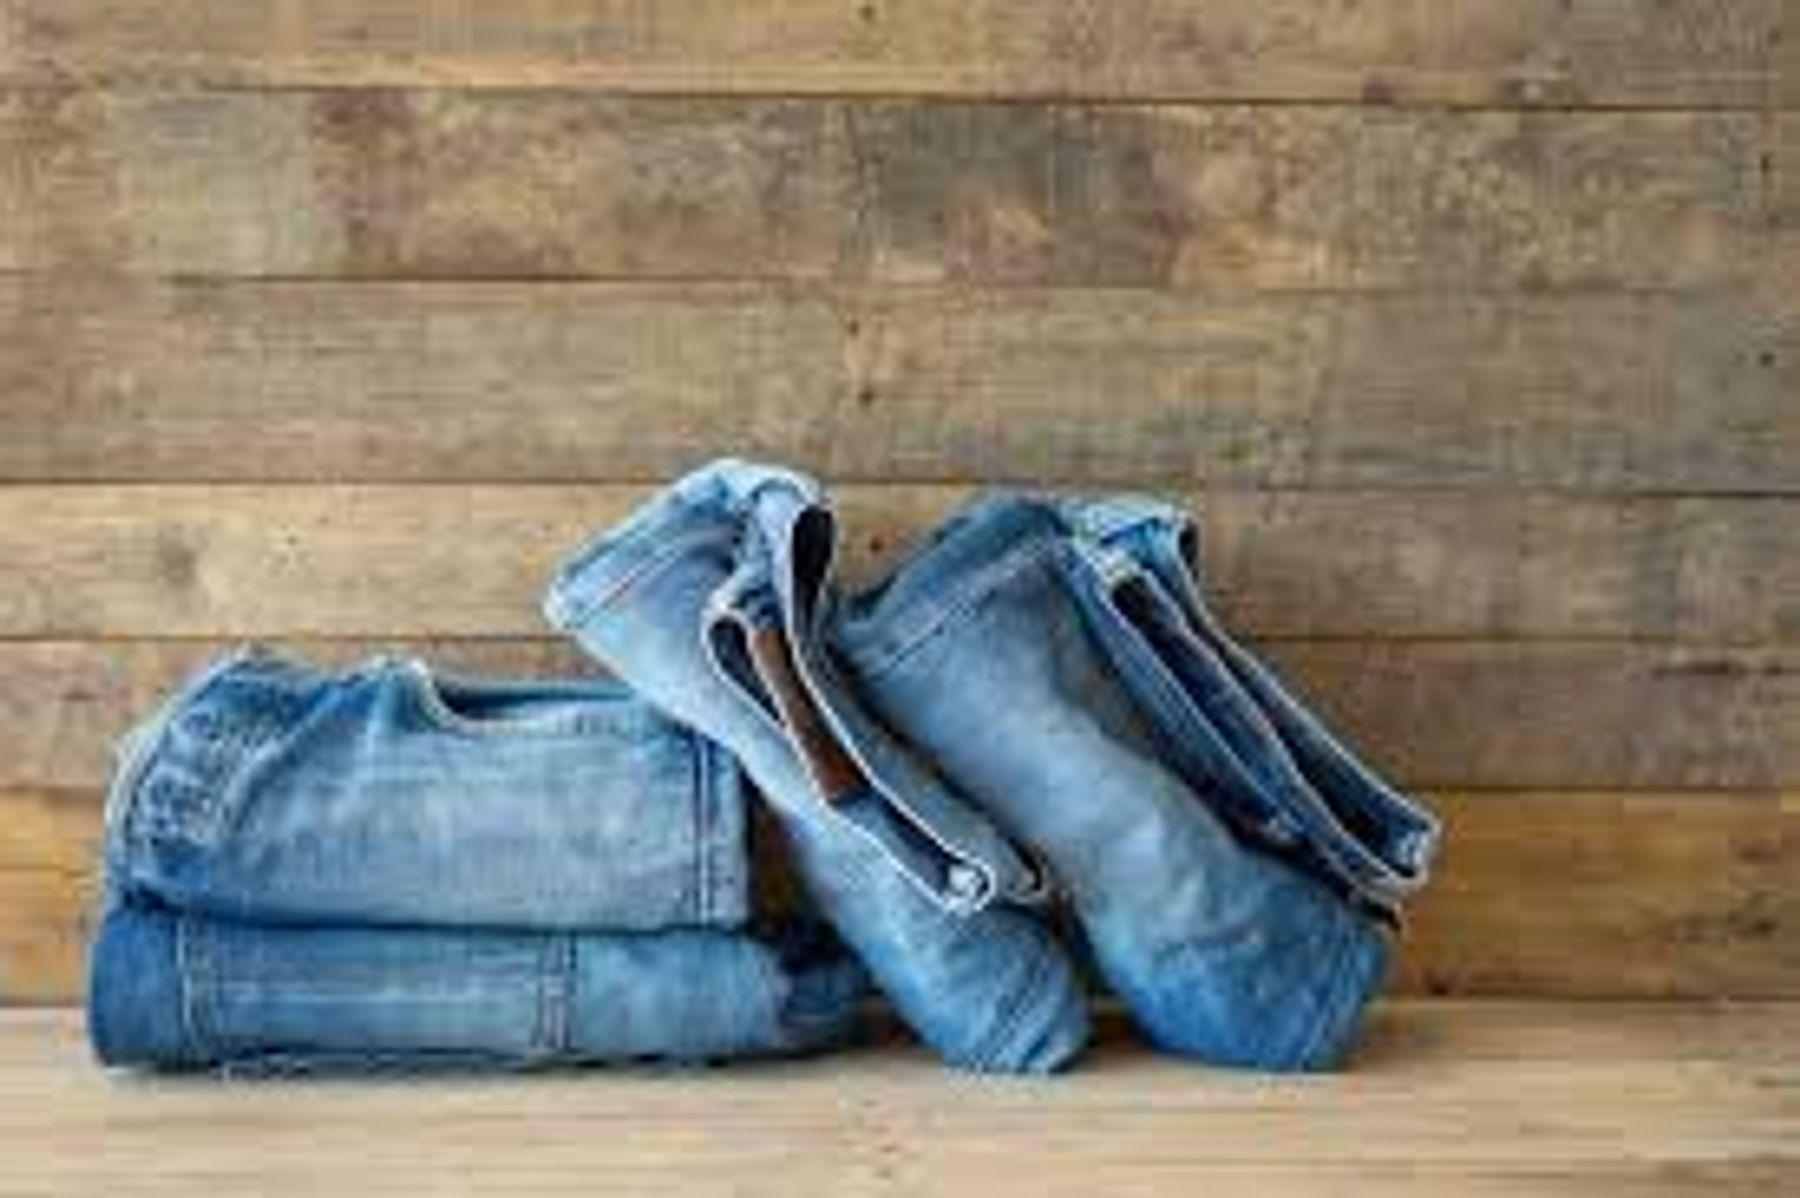 Cách giặt quần jean với máy giặt đúng cách